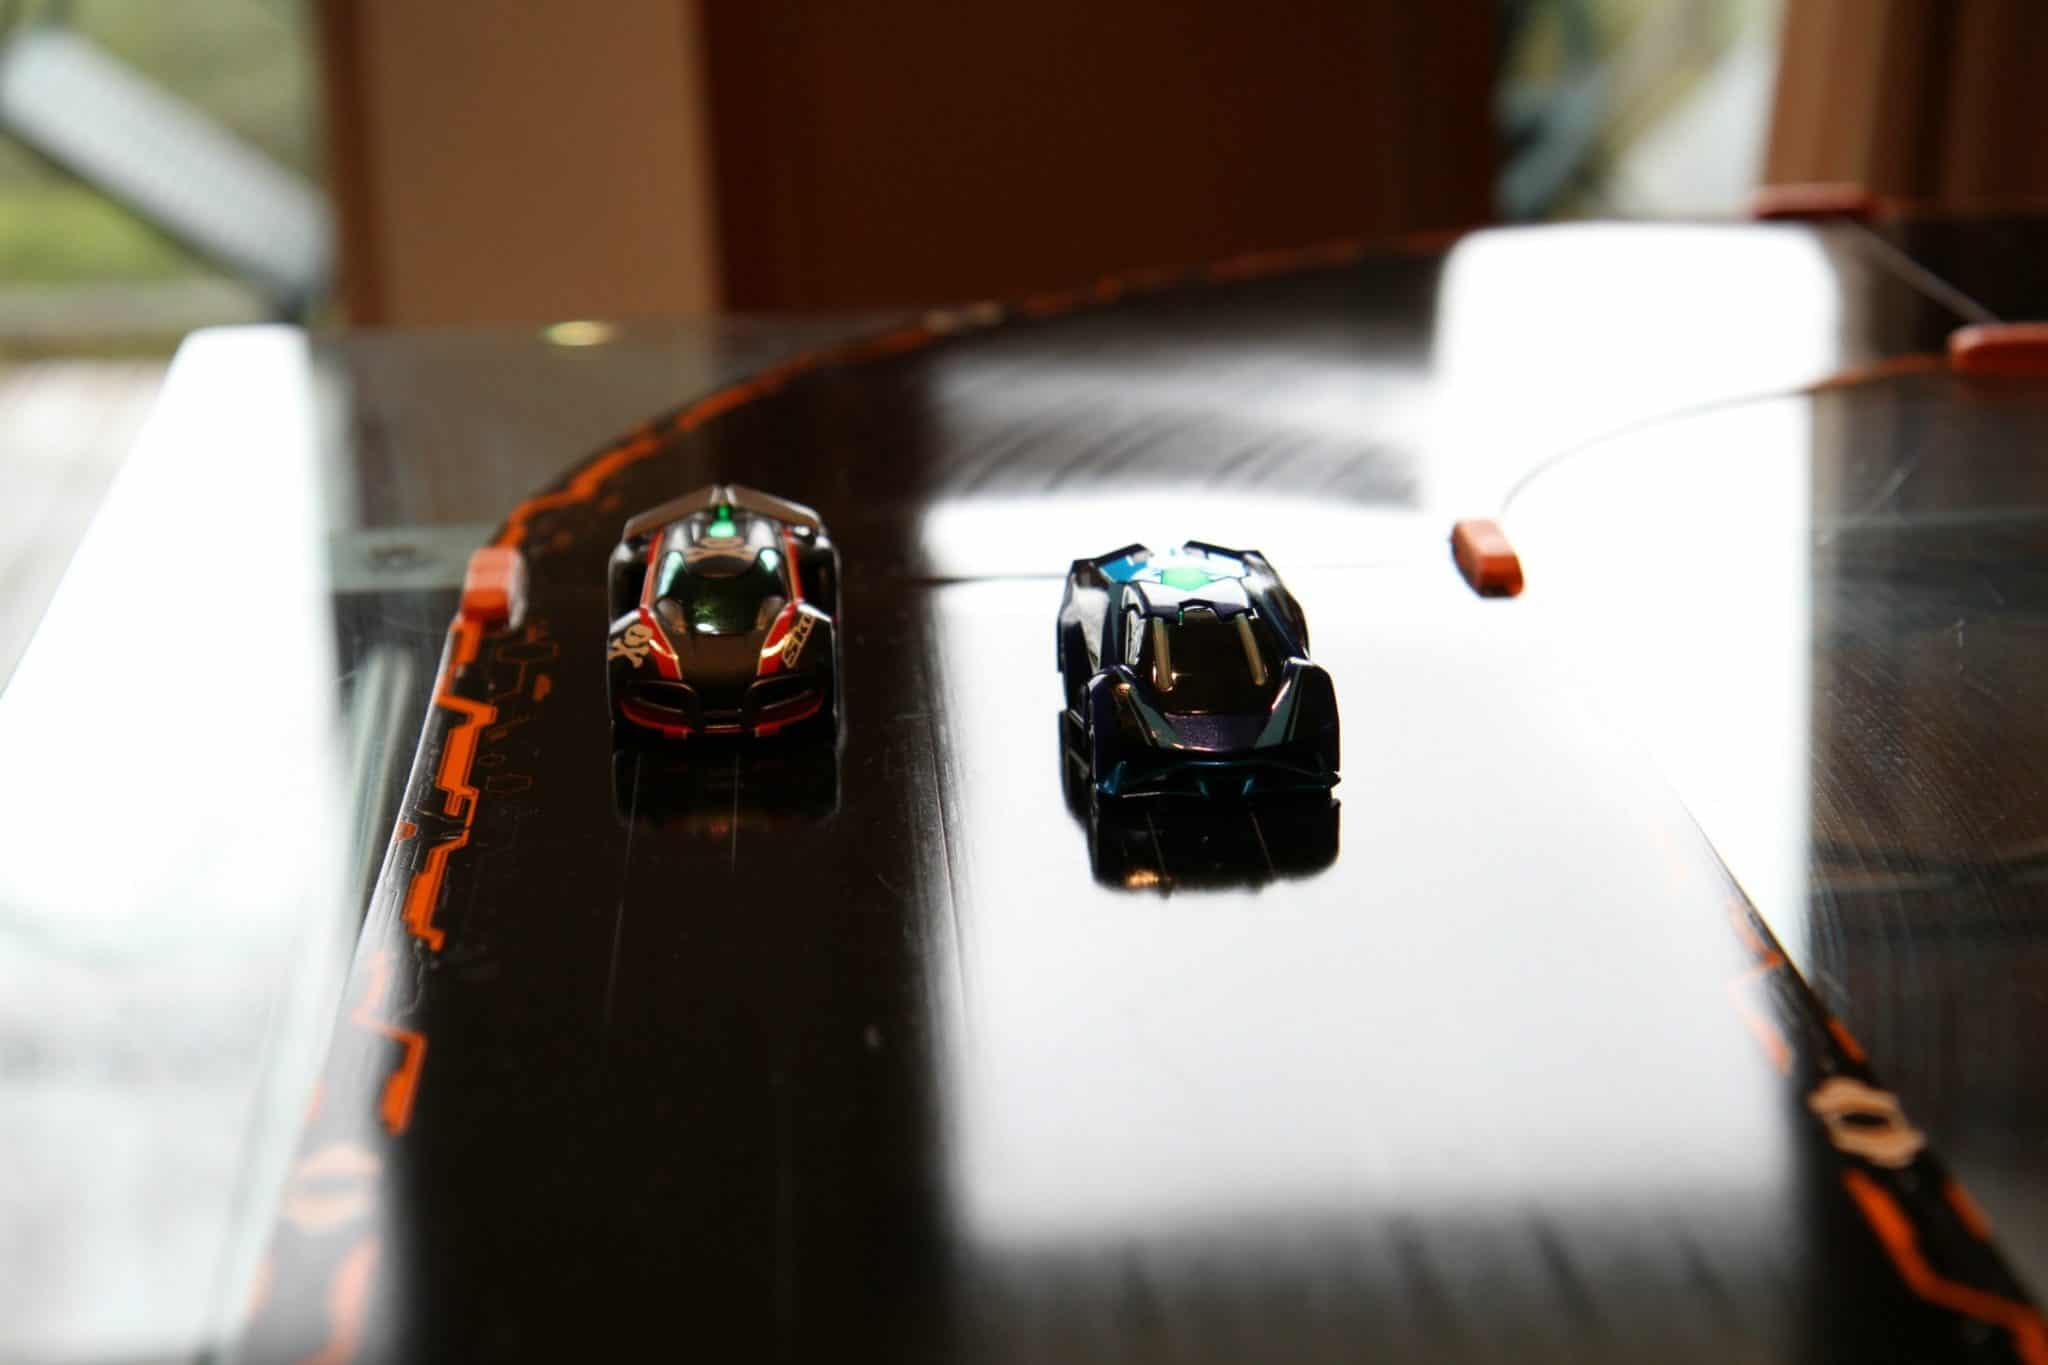 Groundshock and skull-Anki overdrive cars from the starter kit